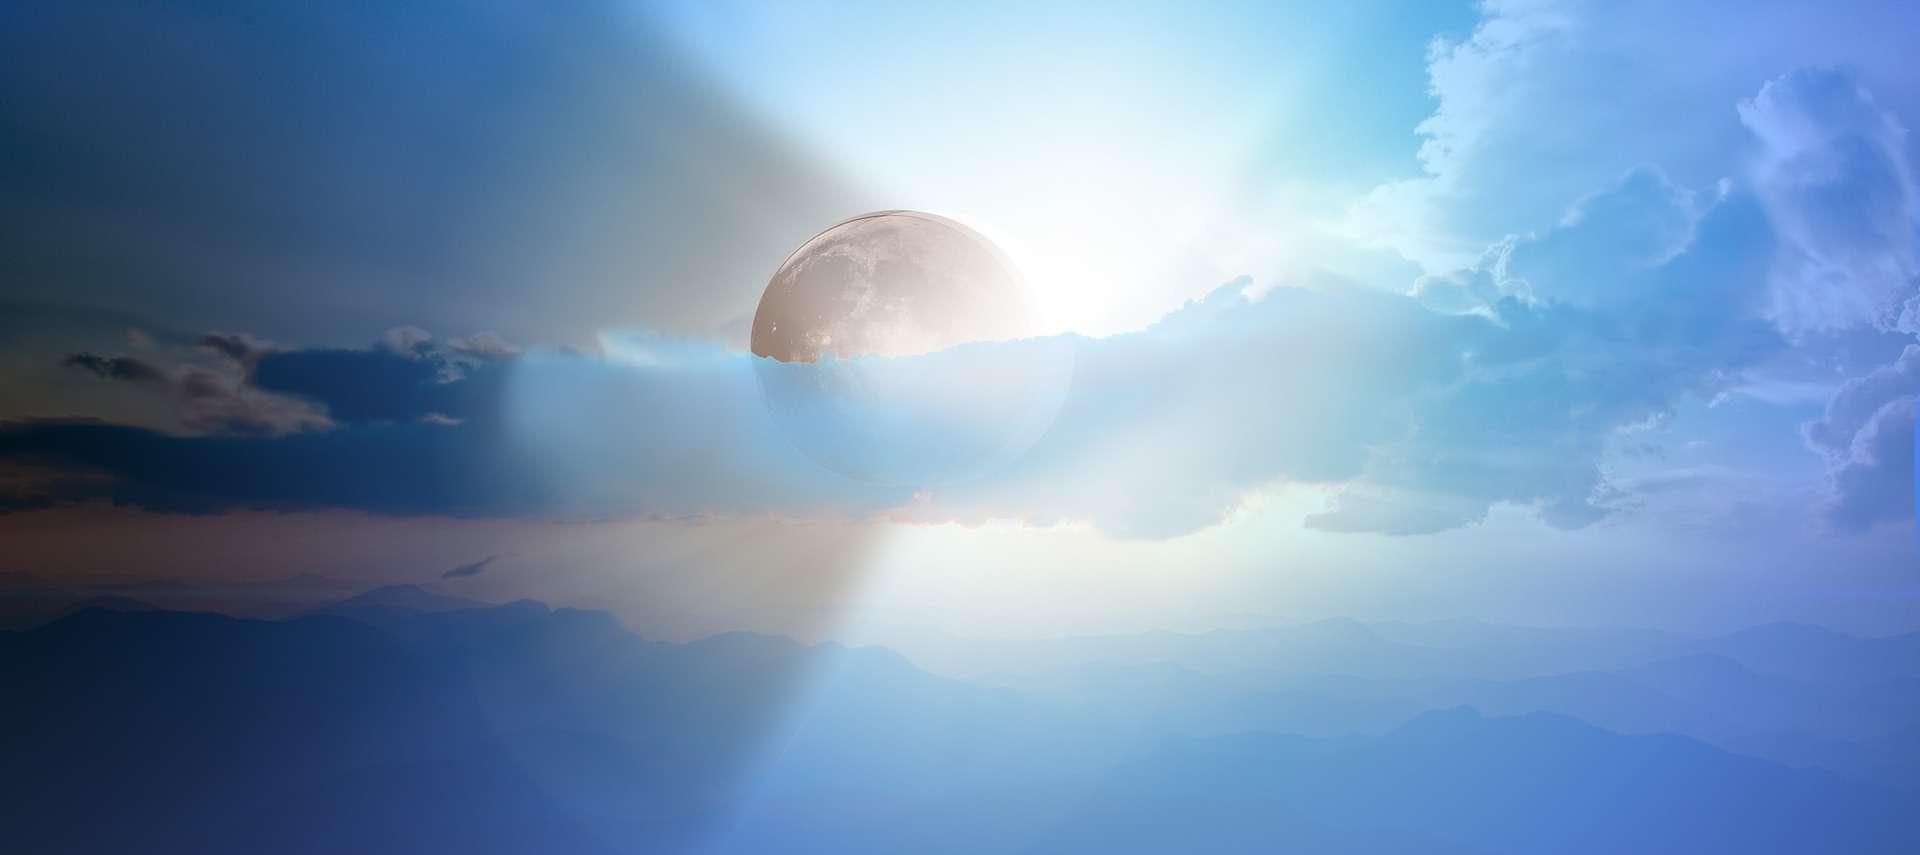 lunar eclipse february 15 2020 astrology leo